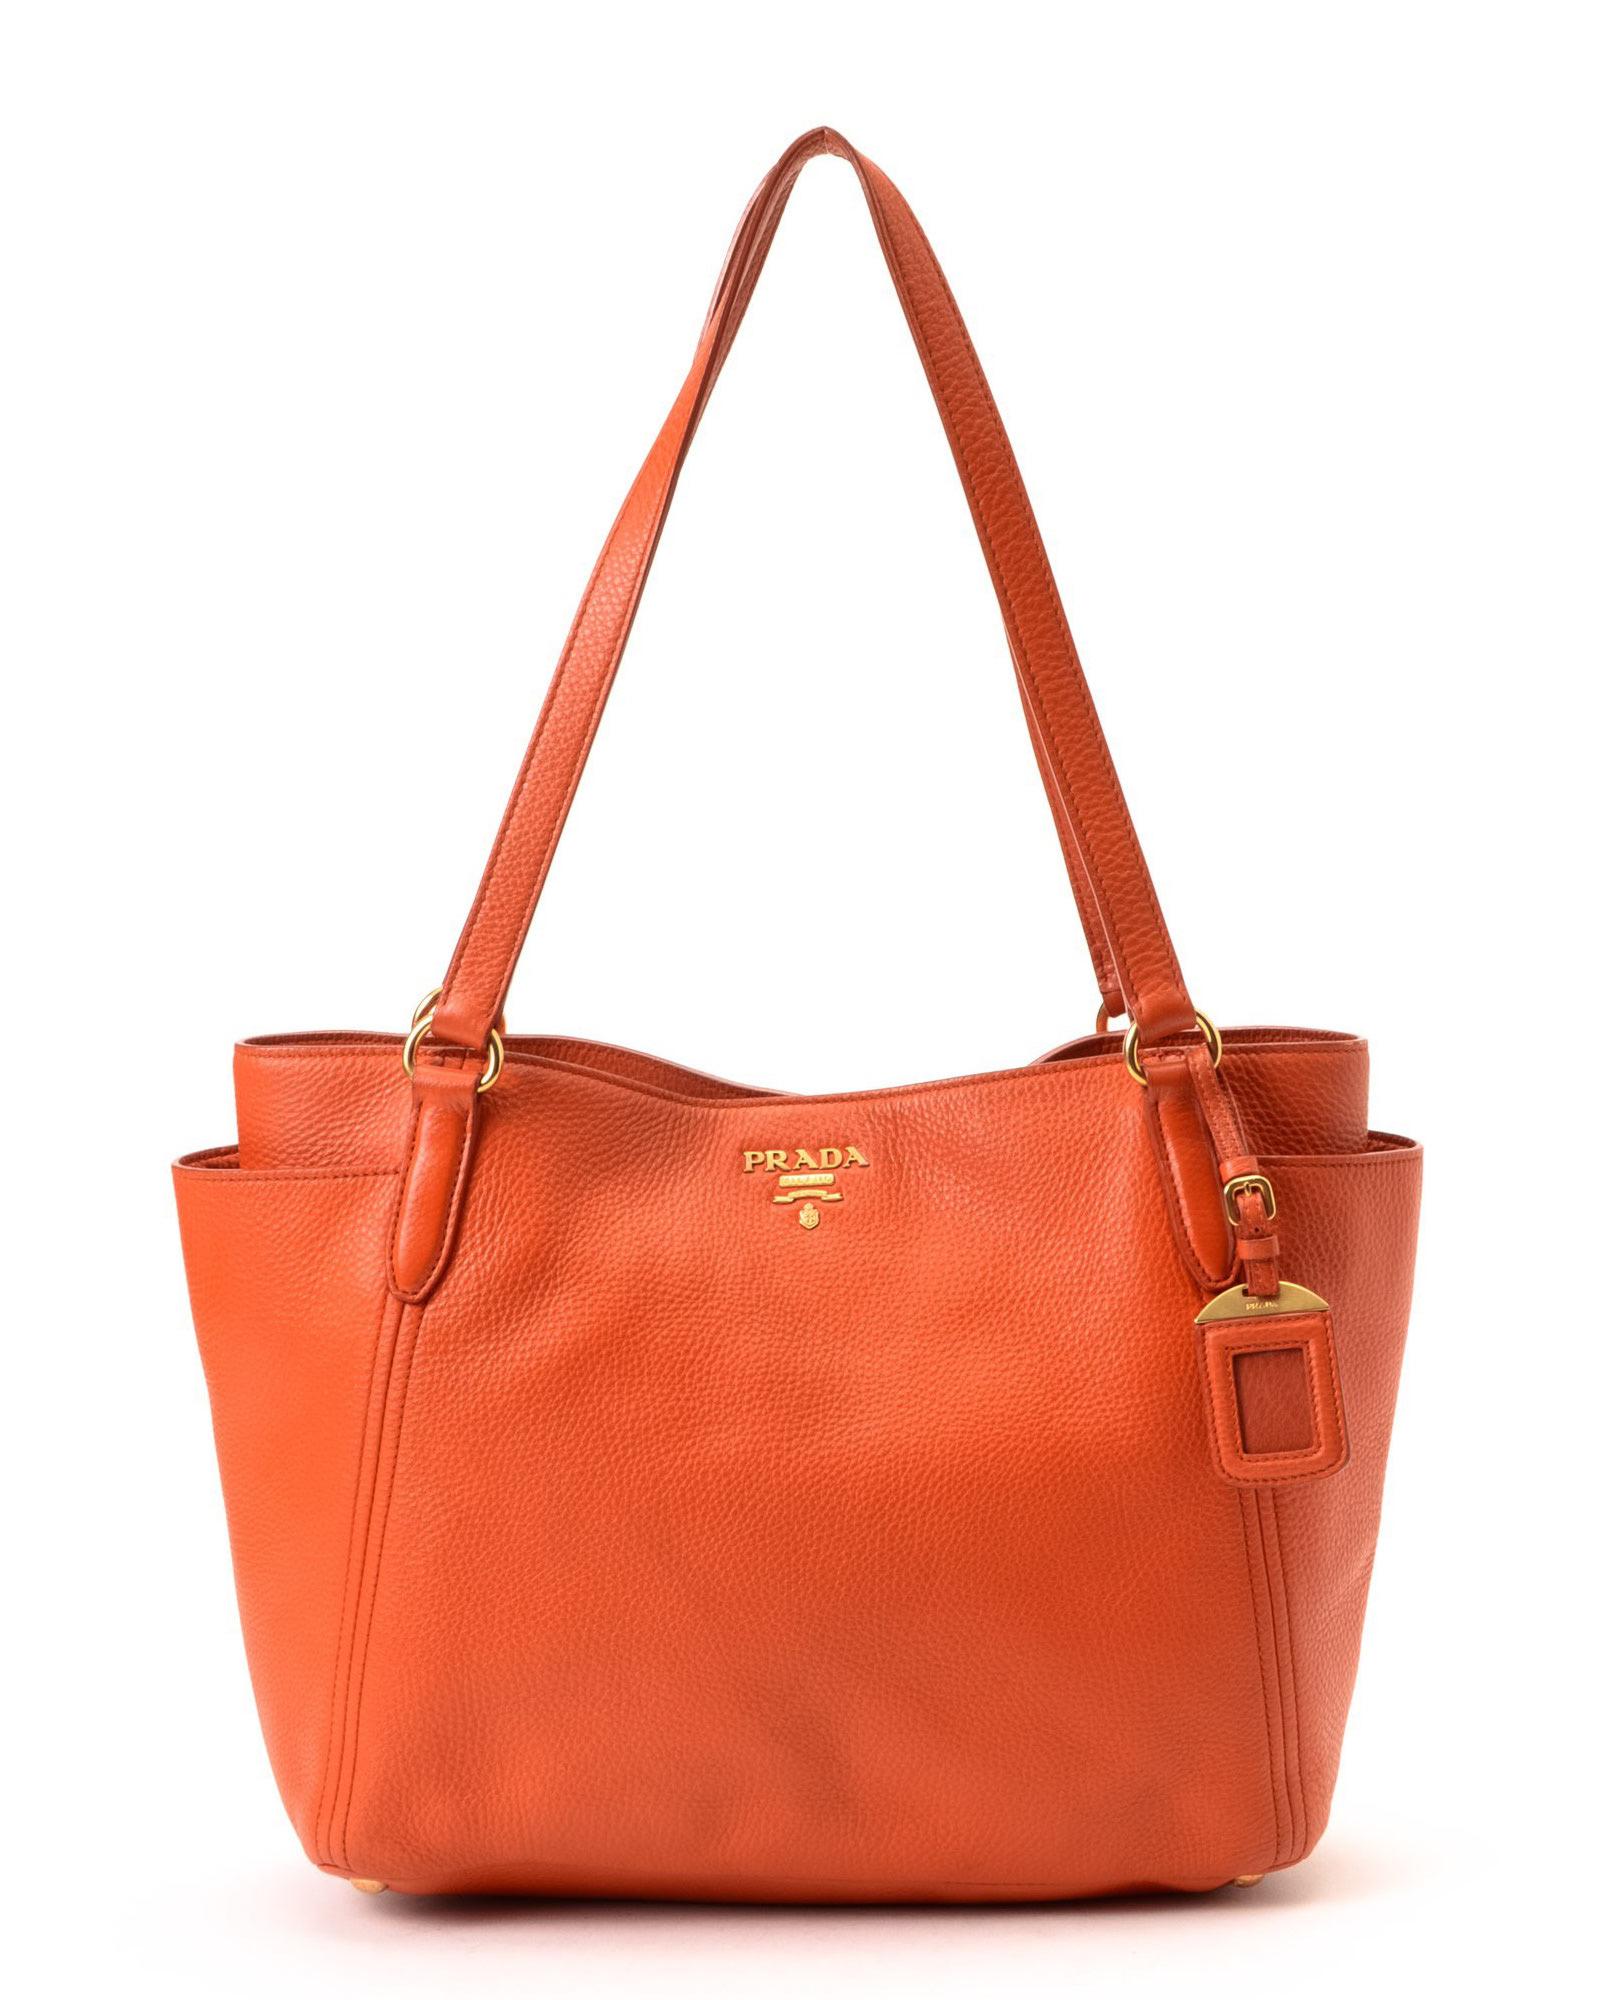 588f69928e90 france prada black nylon shoulder bag lyst 86a39 207aa  low cost lyst prada  tote vintage in orange 0821a ae750